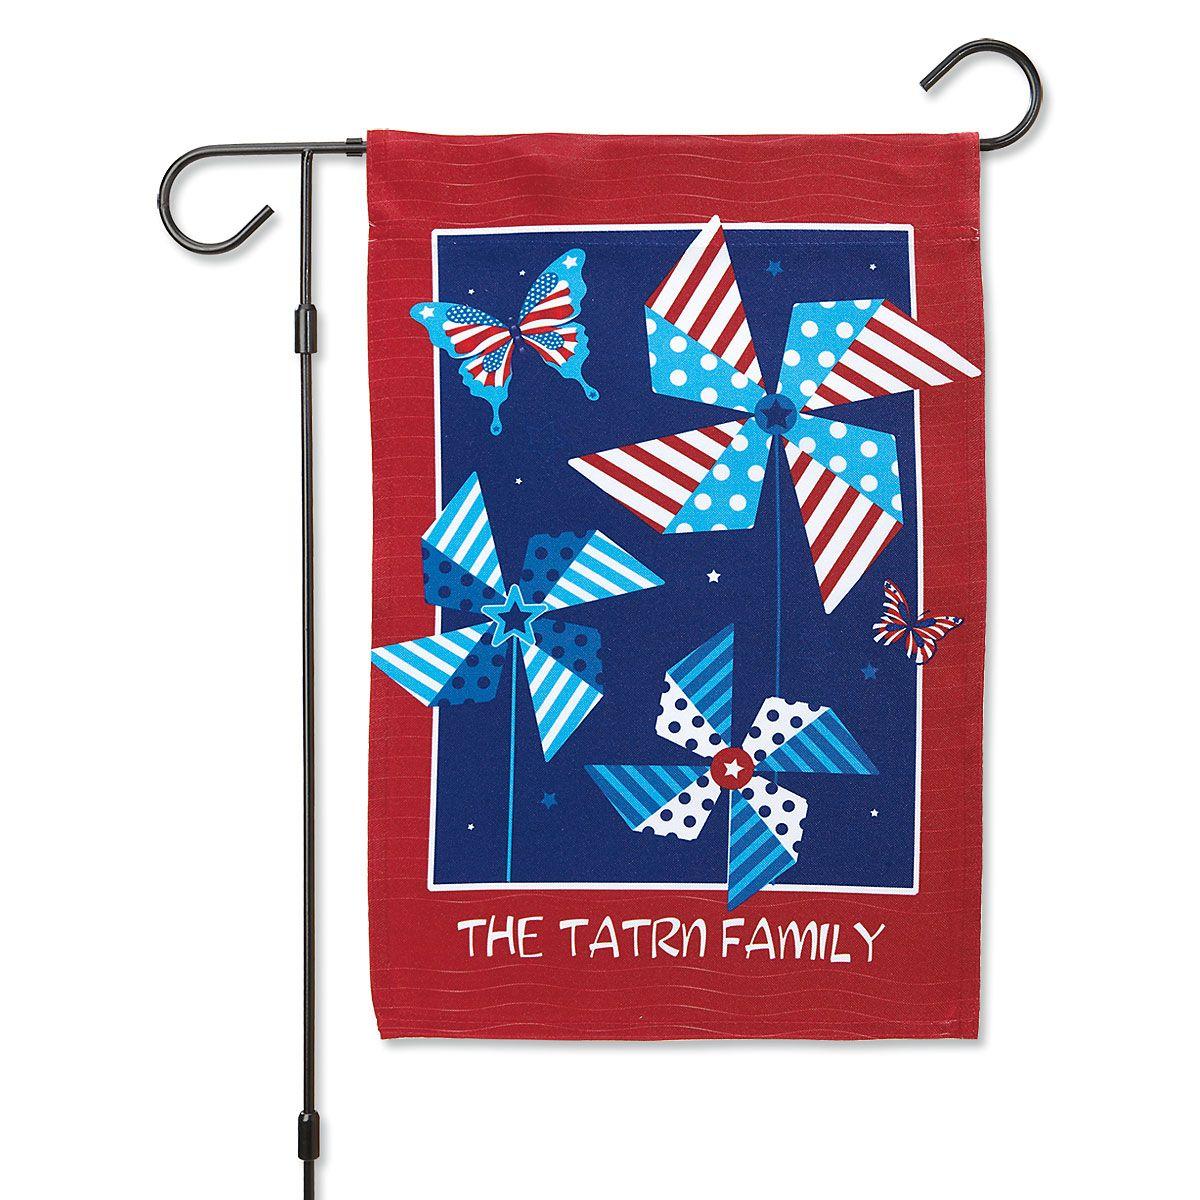 Personalized Patriotic Garden Flag